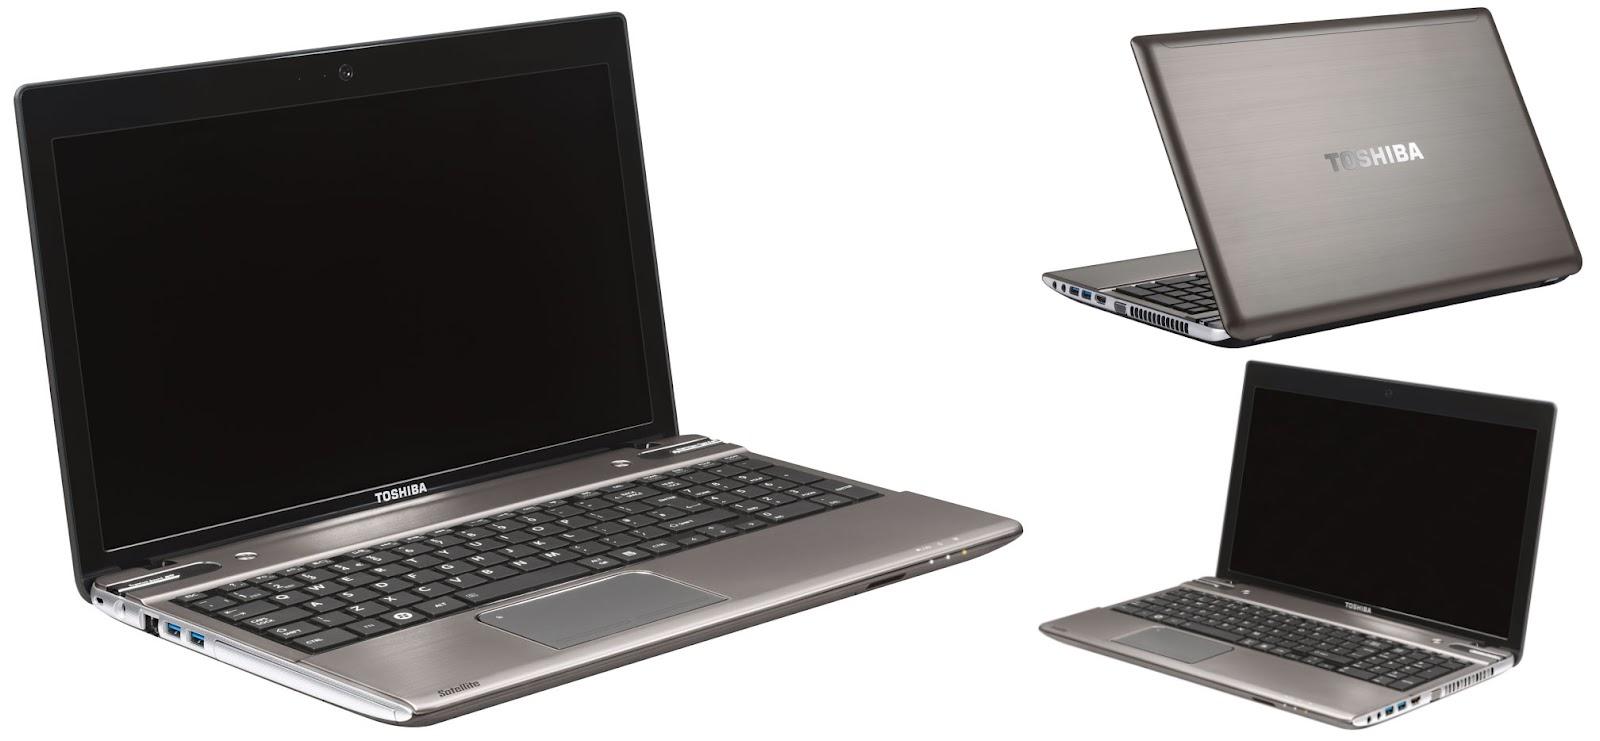 Toshiba Satellite A200 (PSAE0) Synaptics TouchPad Driver FREE